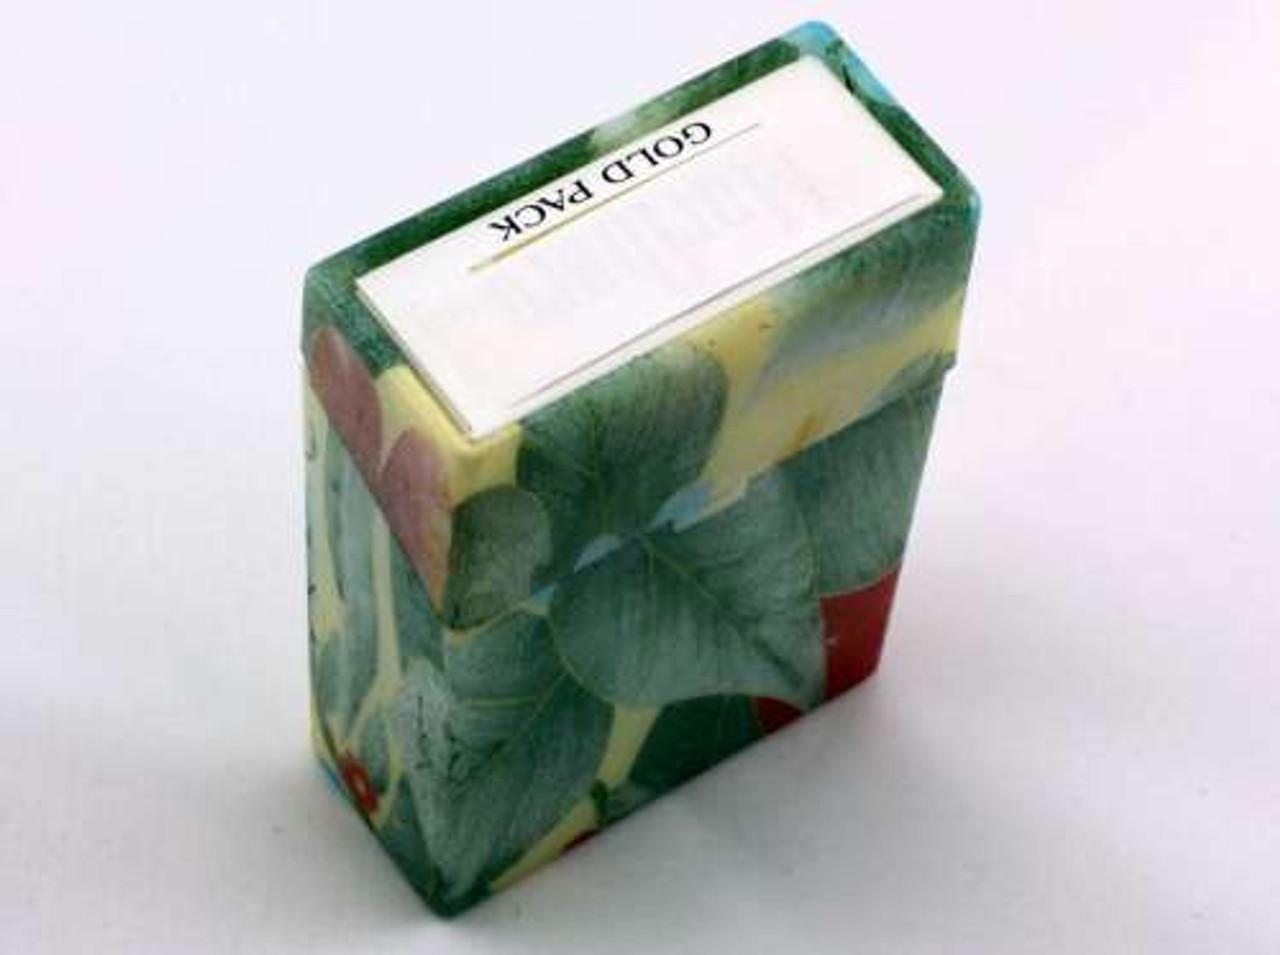 Tropical Cigarette Pack Holder